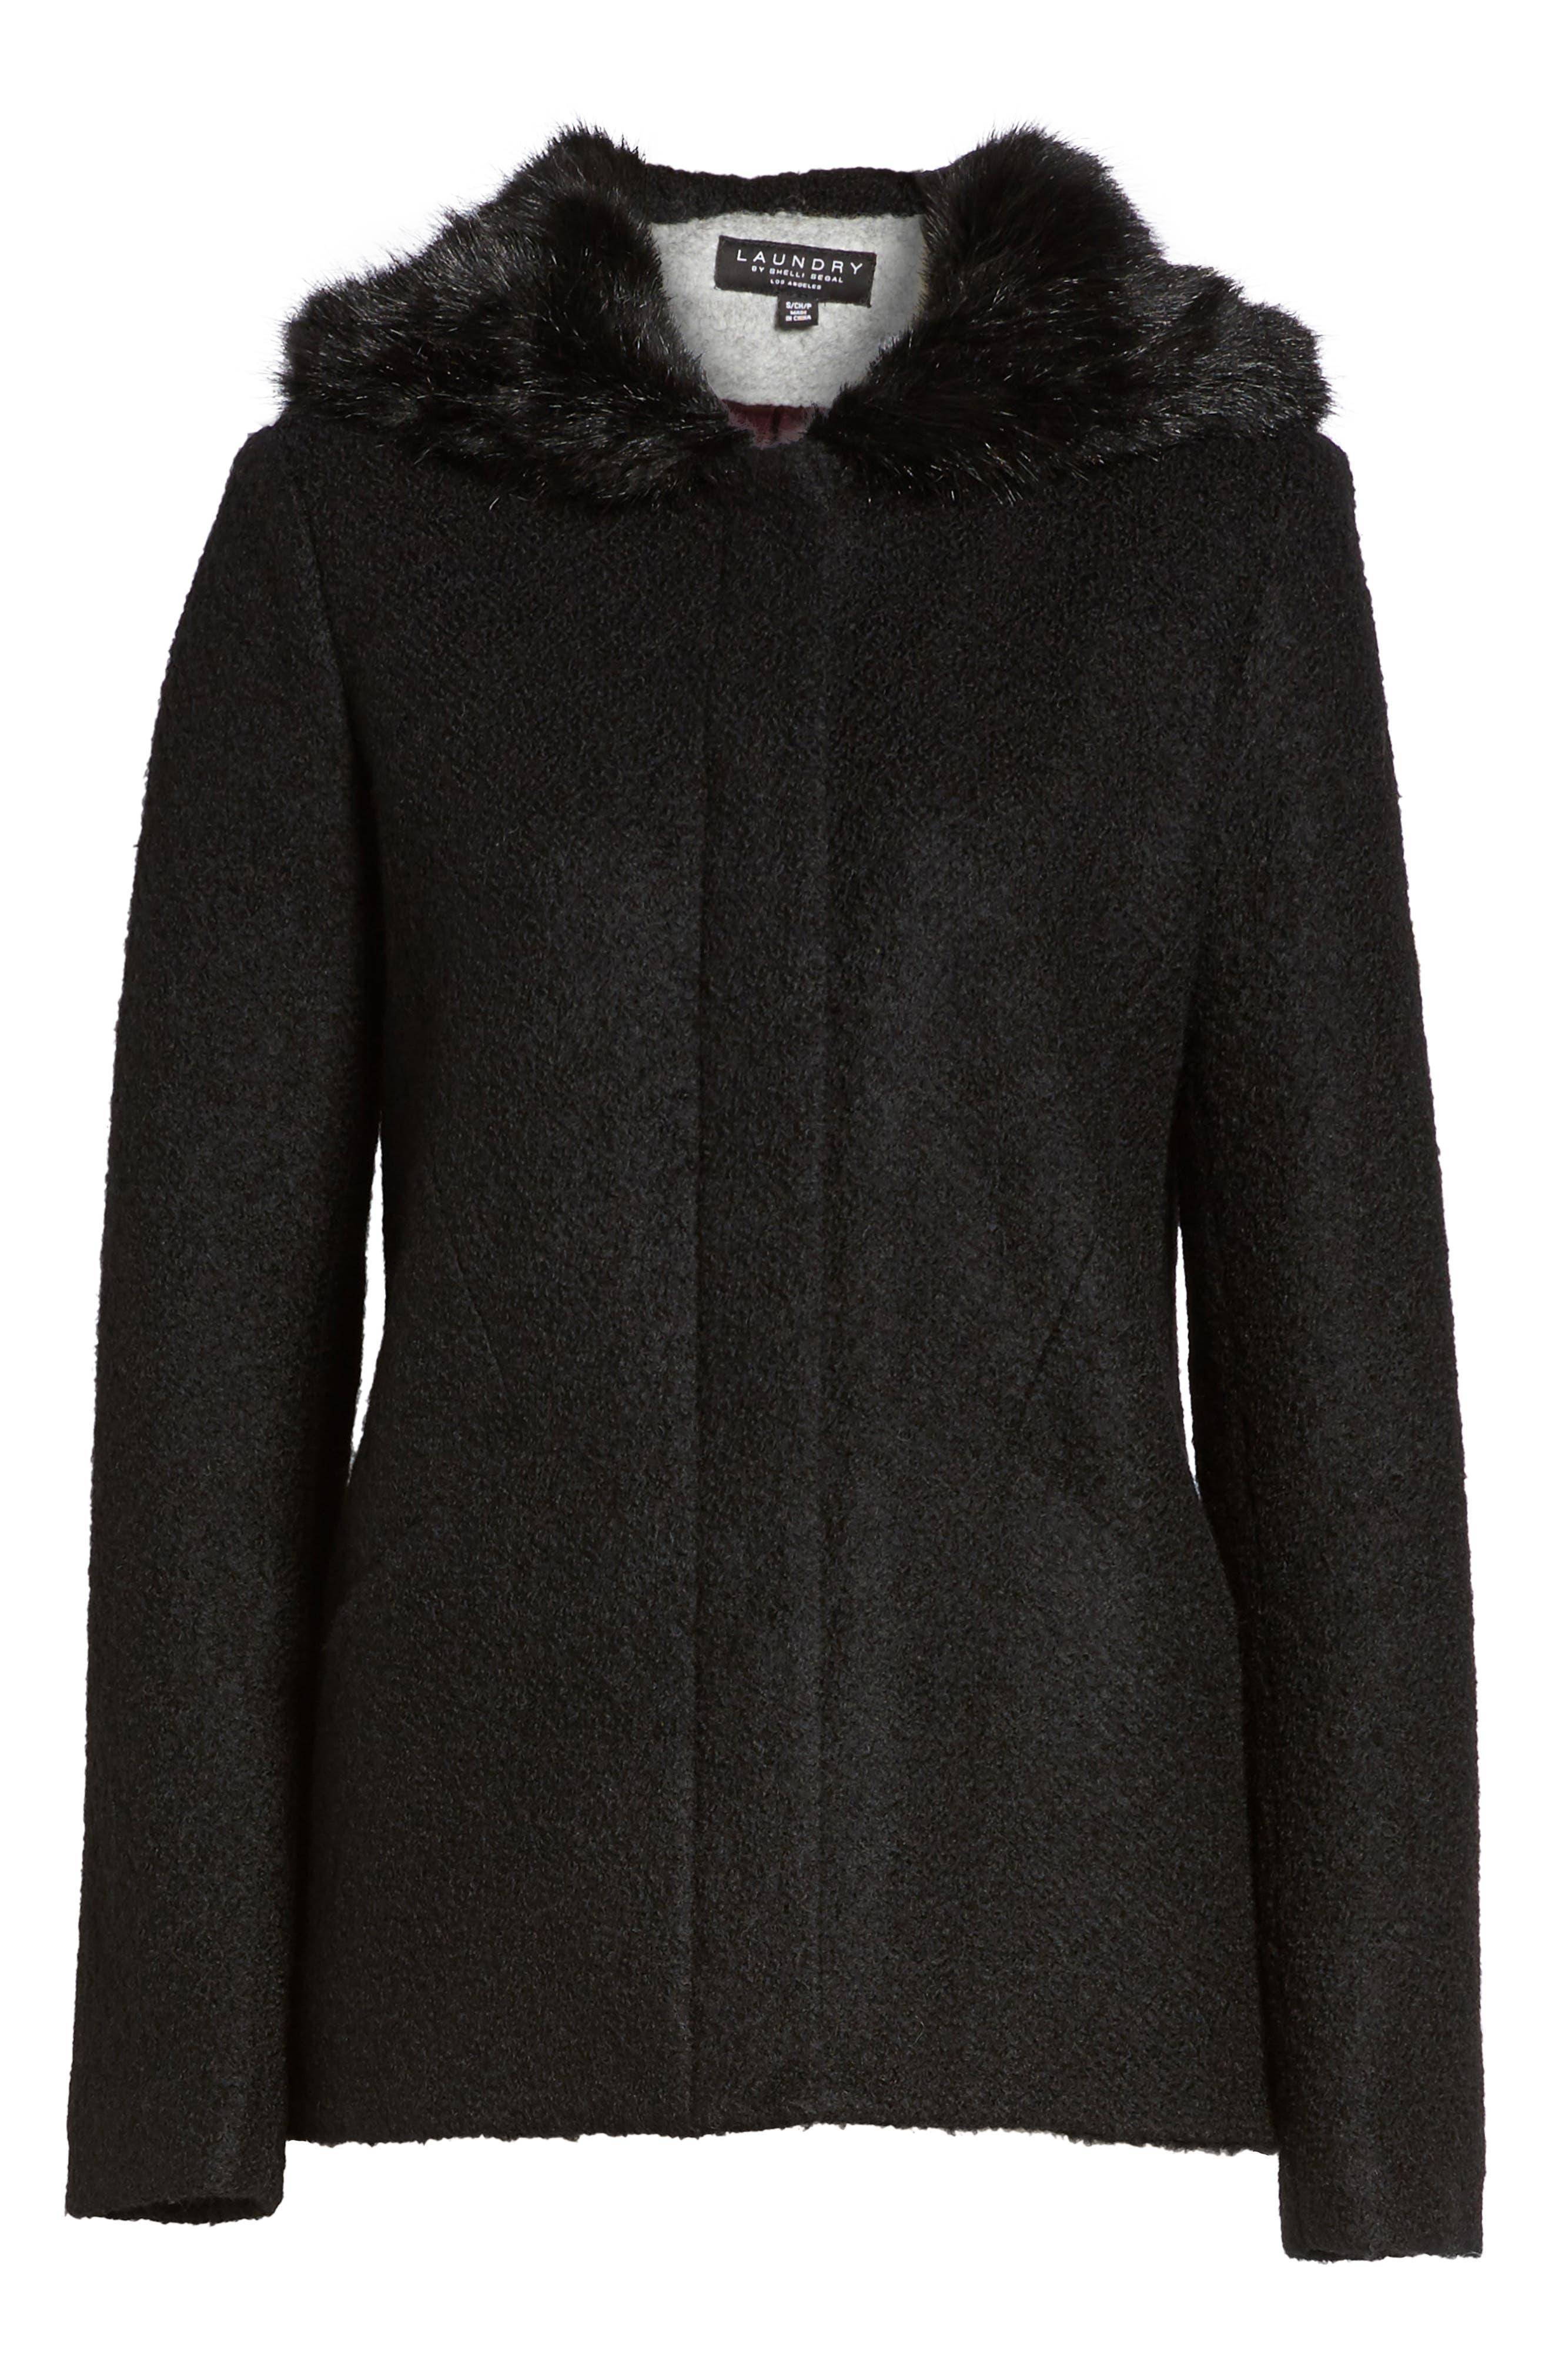 Hooded Wool Blend Bouclé Jacket with Faux Fur Trim,                             Alternate thumbnail 5, color,                             001